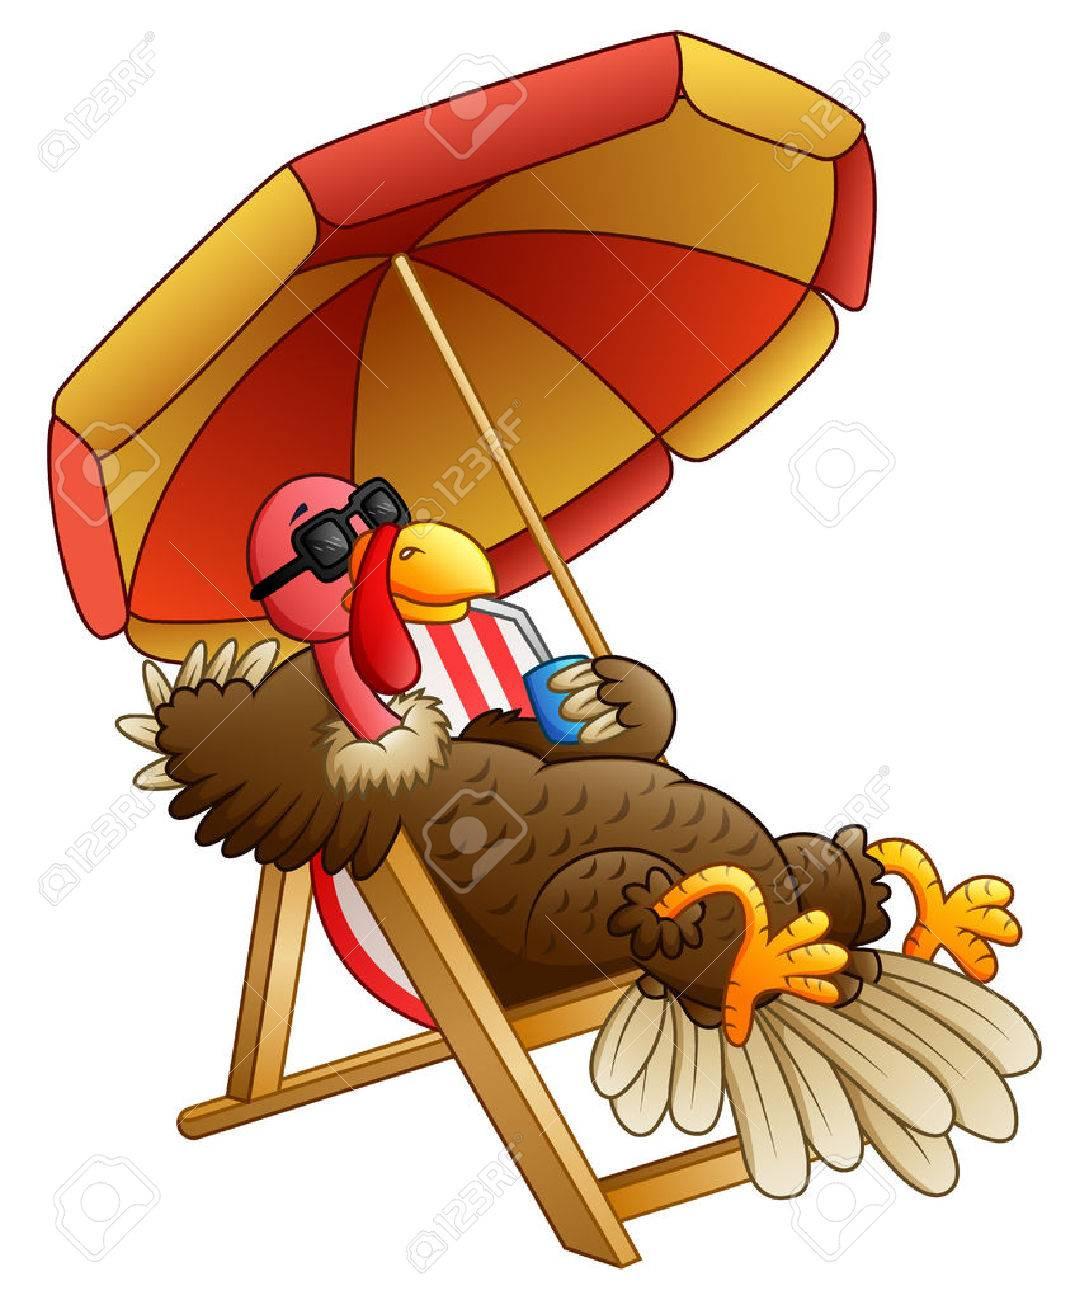 A Vector illustration of Cartoon turkey bird sitting on beach chair. - 87171942